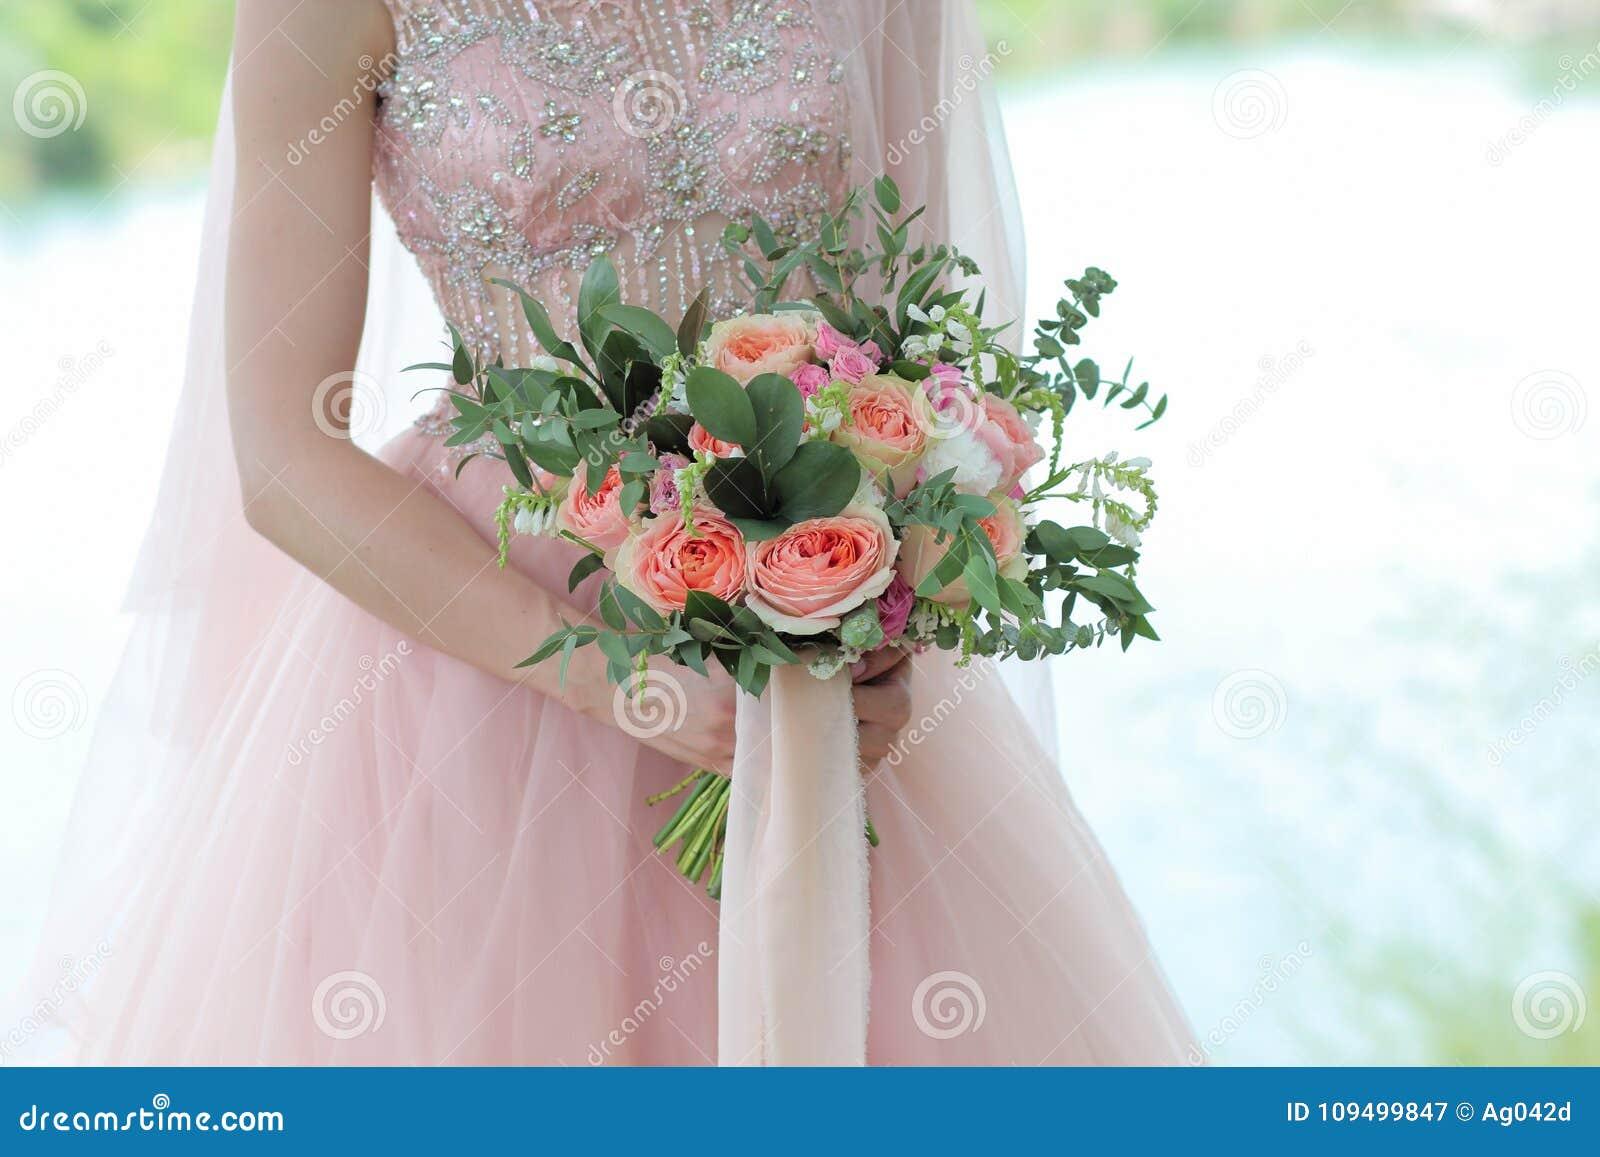 Bride Holding A Beautiful Bridal Bouquet. Wedding Bouquet Of Peach ...